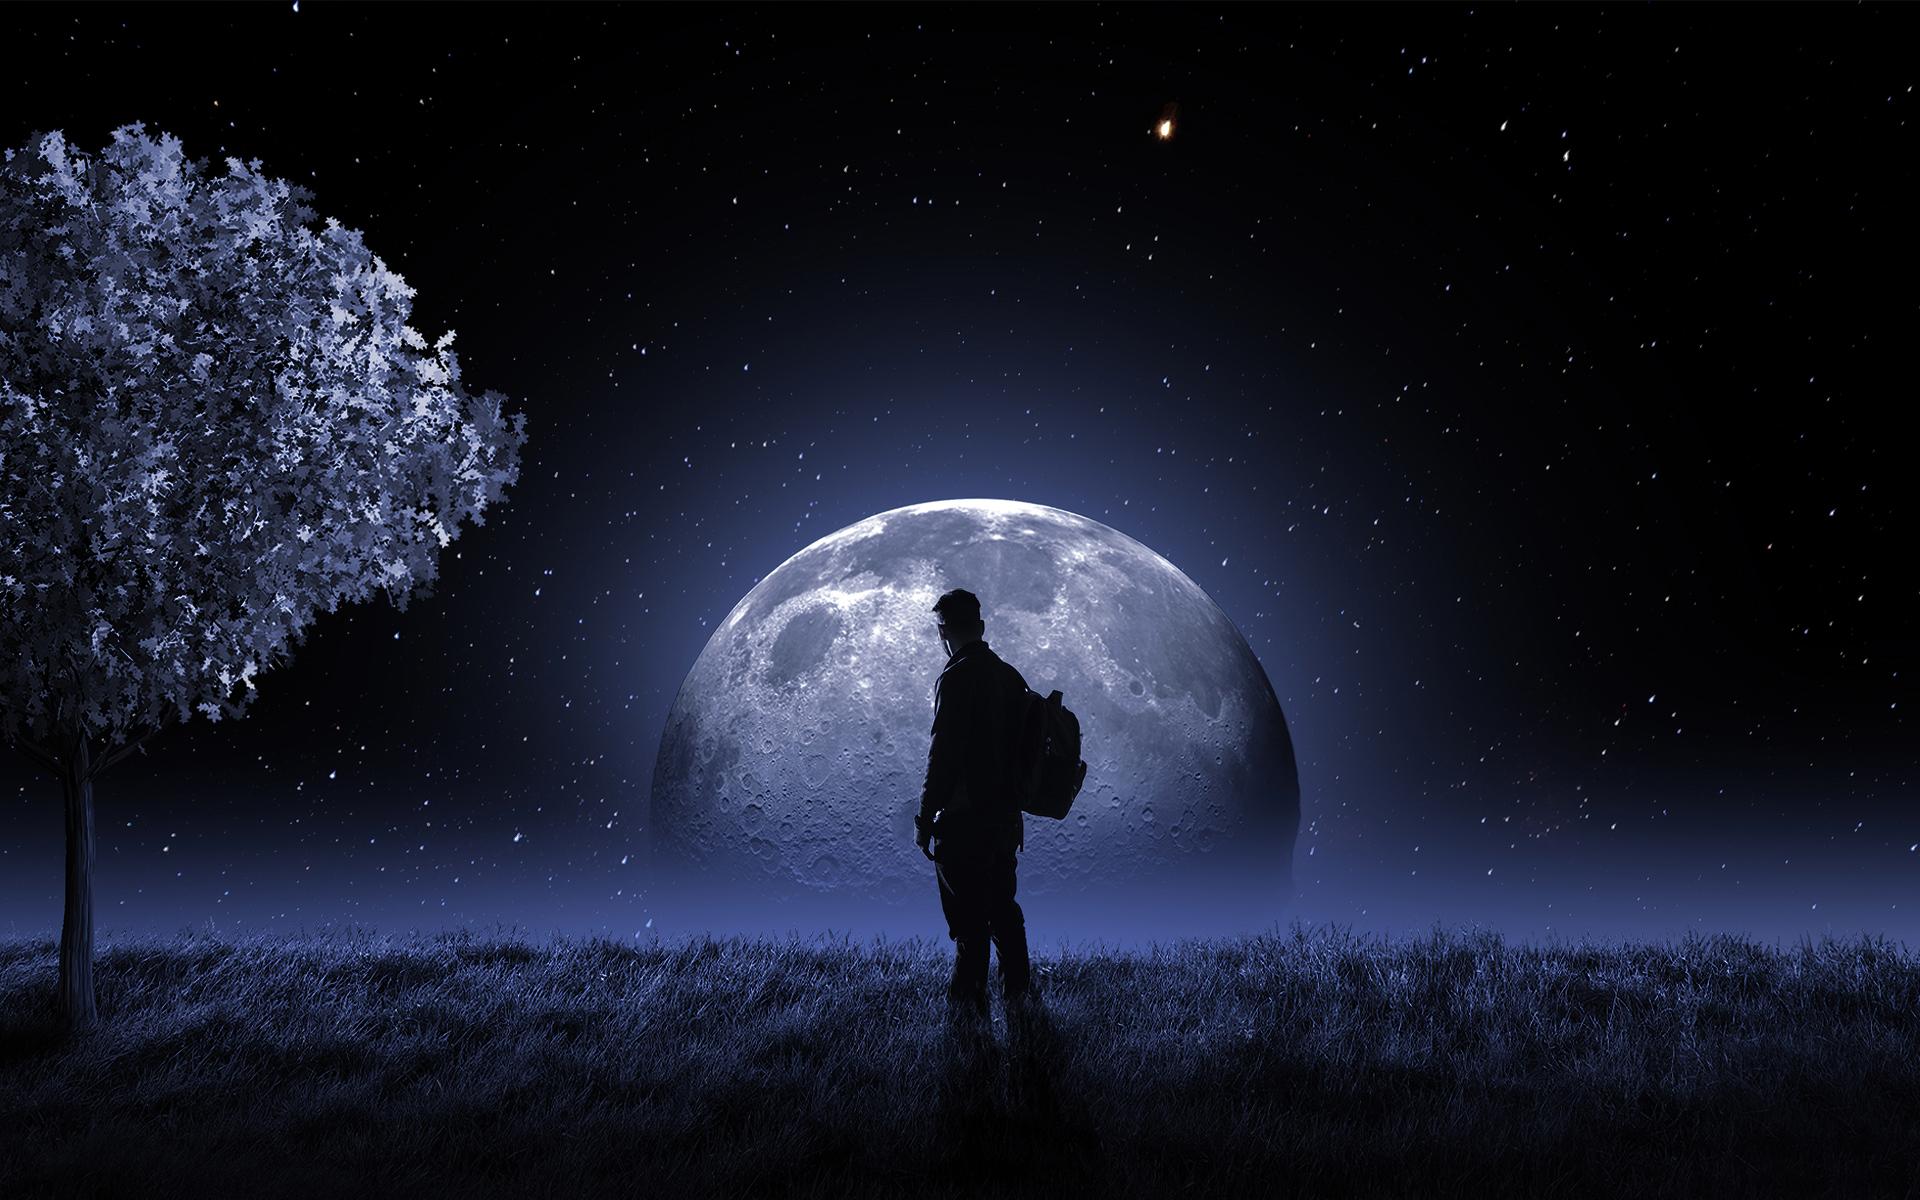 moon-and-me-5k-ej.jpg